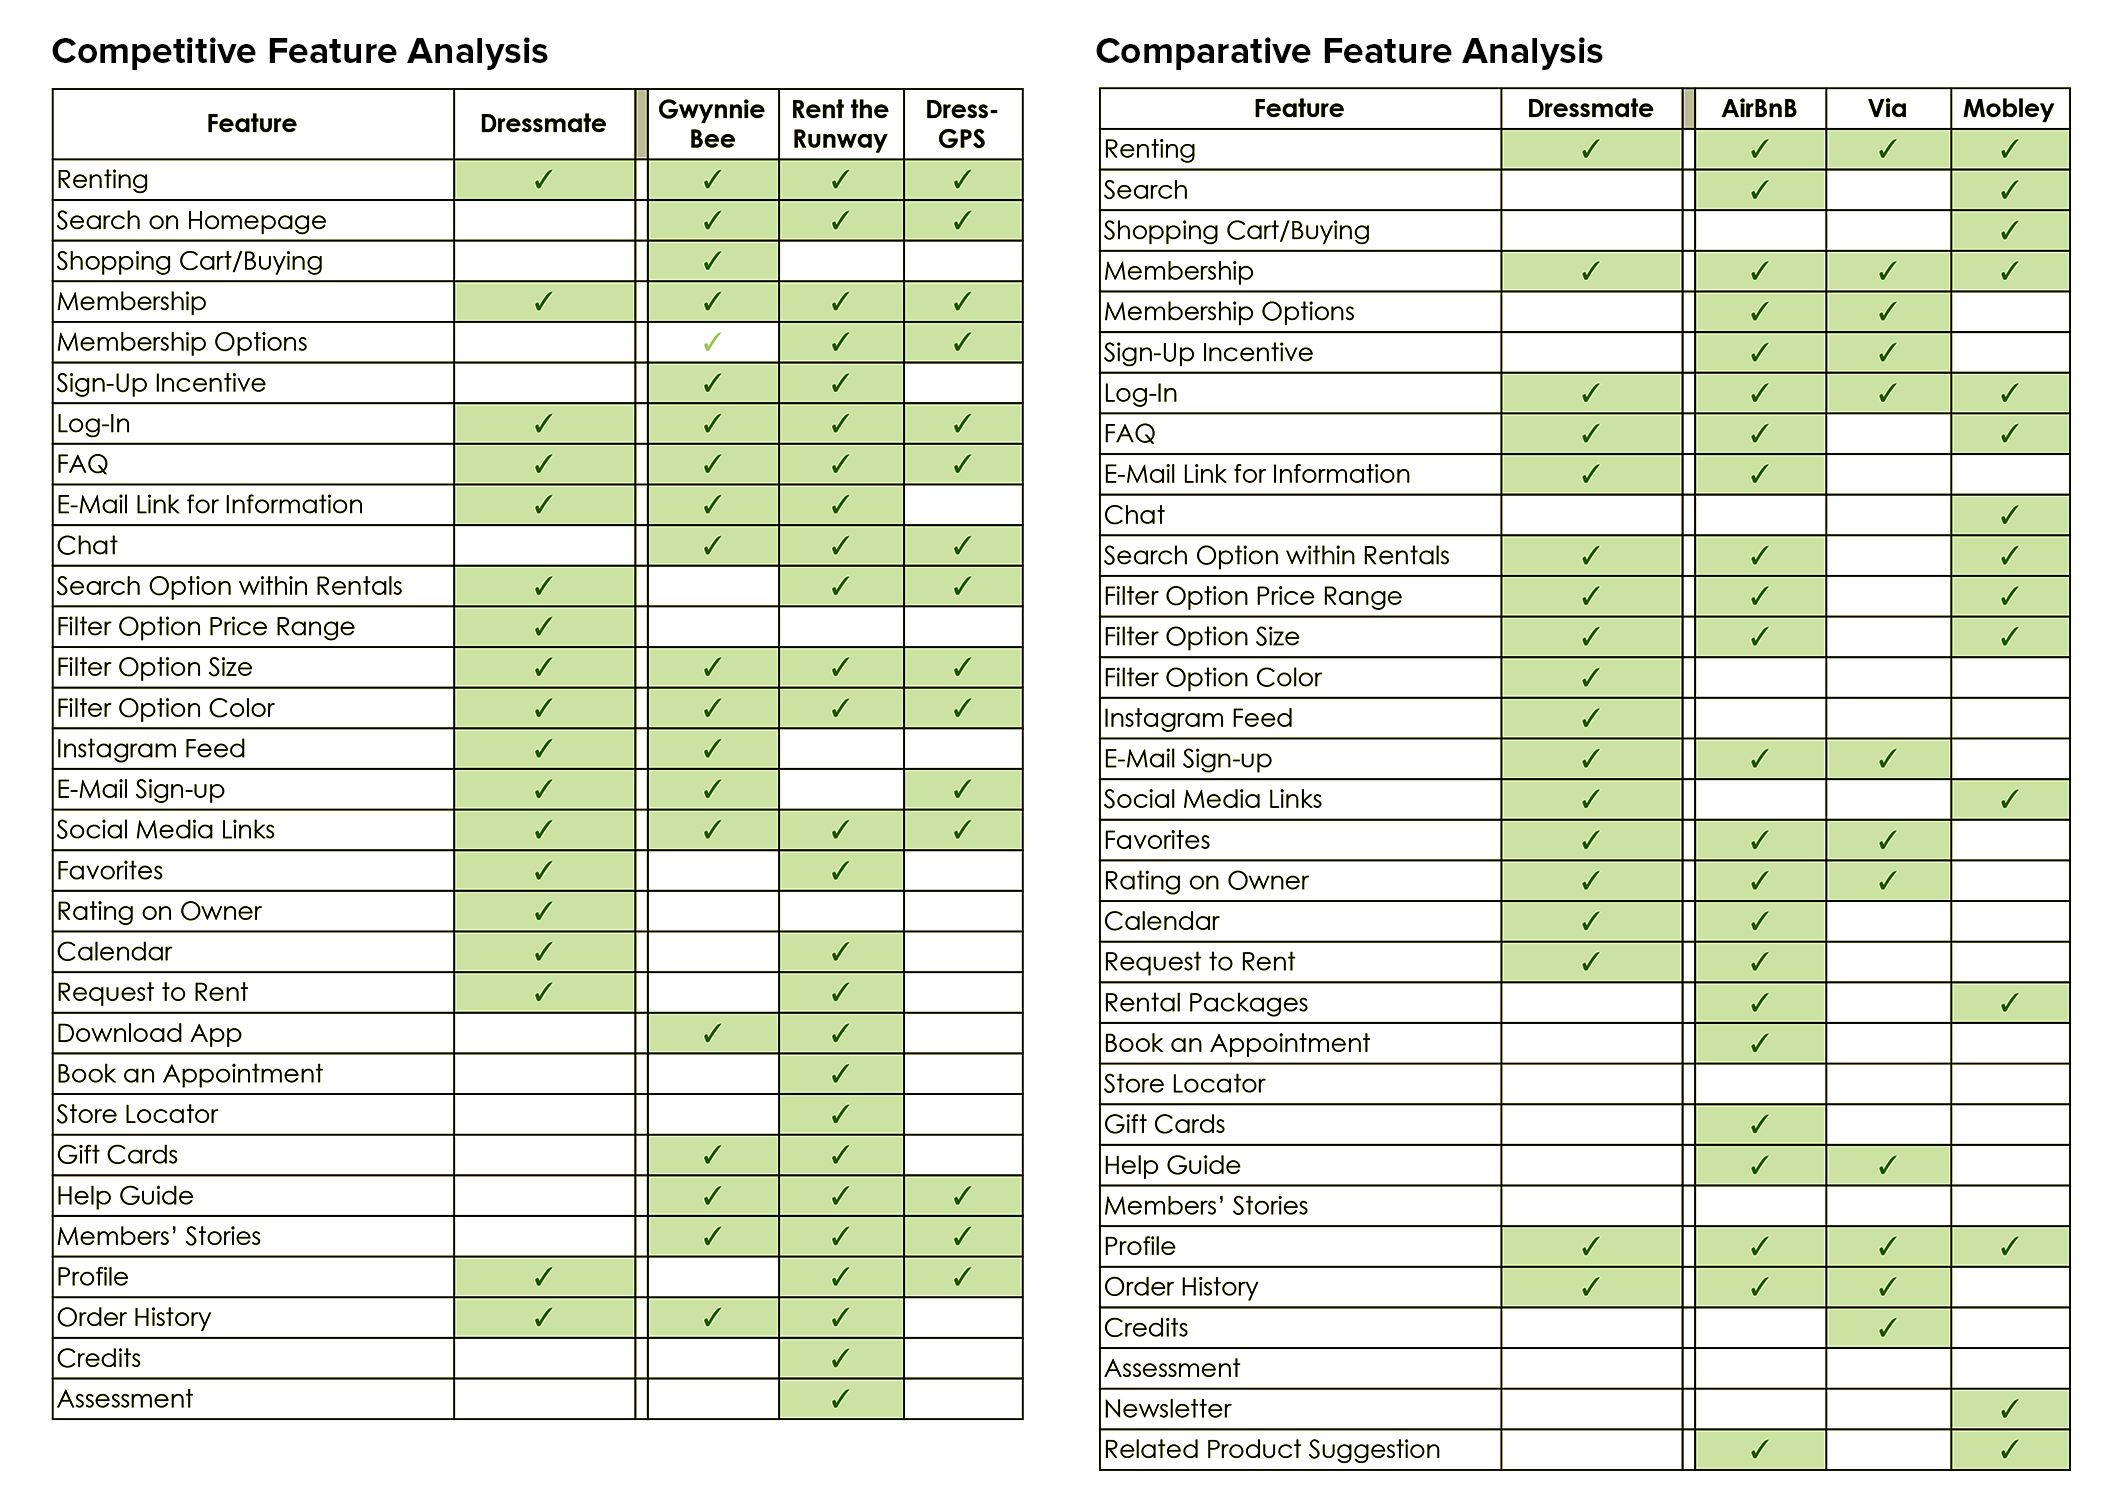 P5_Dressmate_Competitive_Comparative_FeatureAnalysis-1.jpg